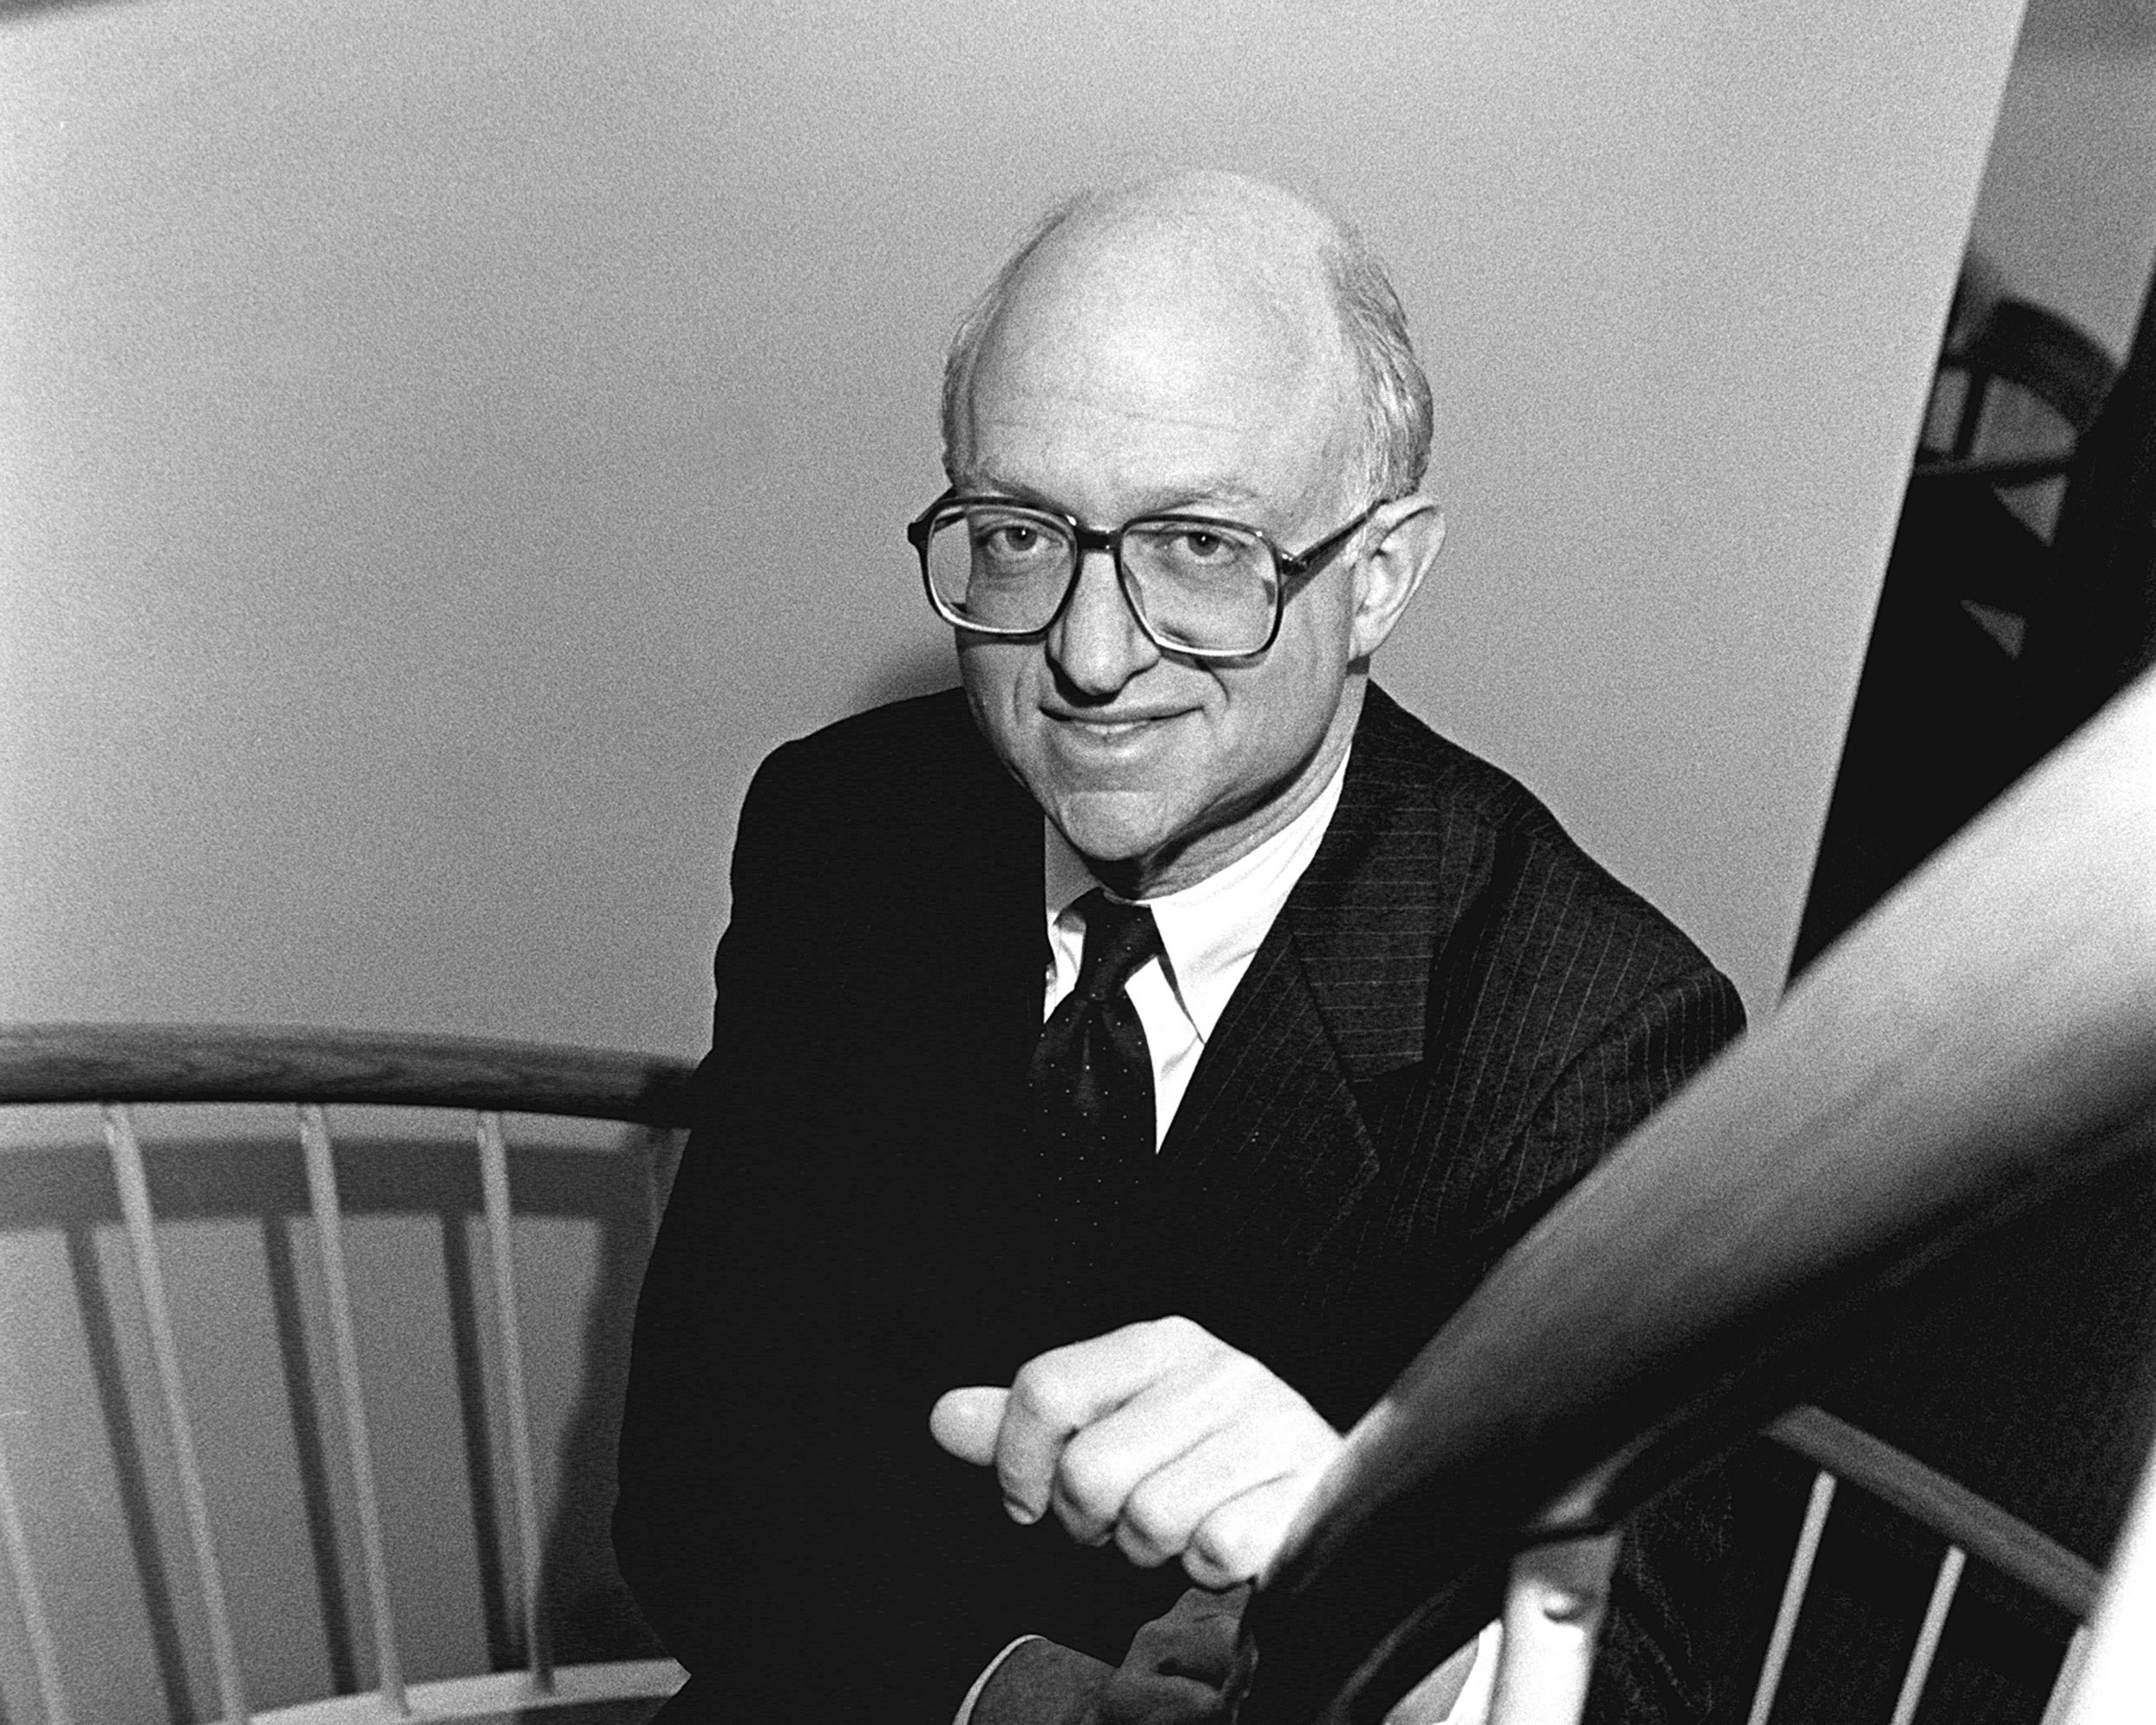 Faculty portrait of Martin Feldstein